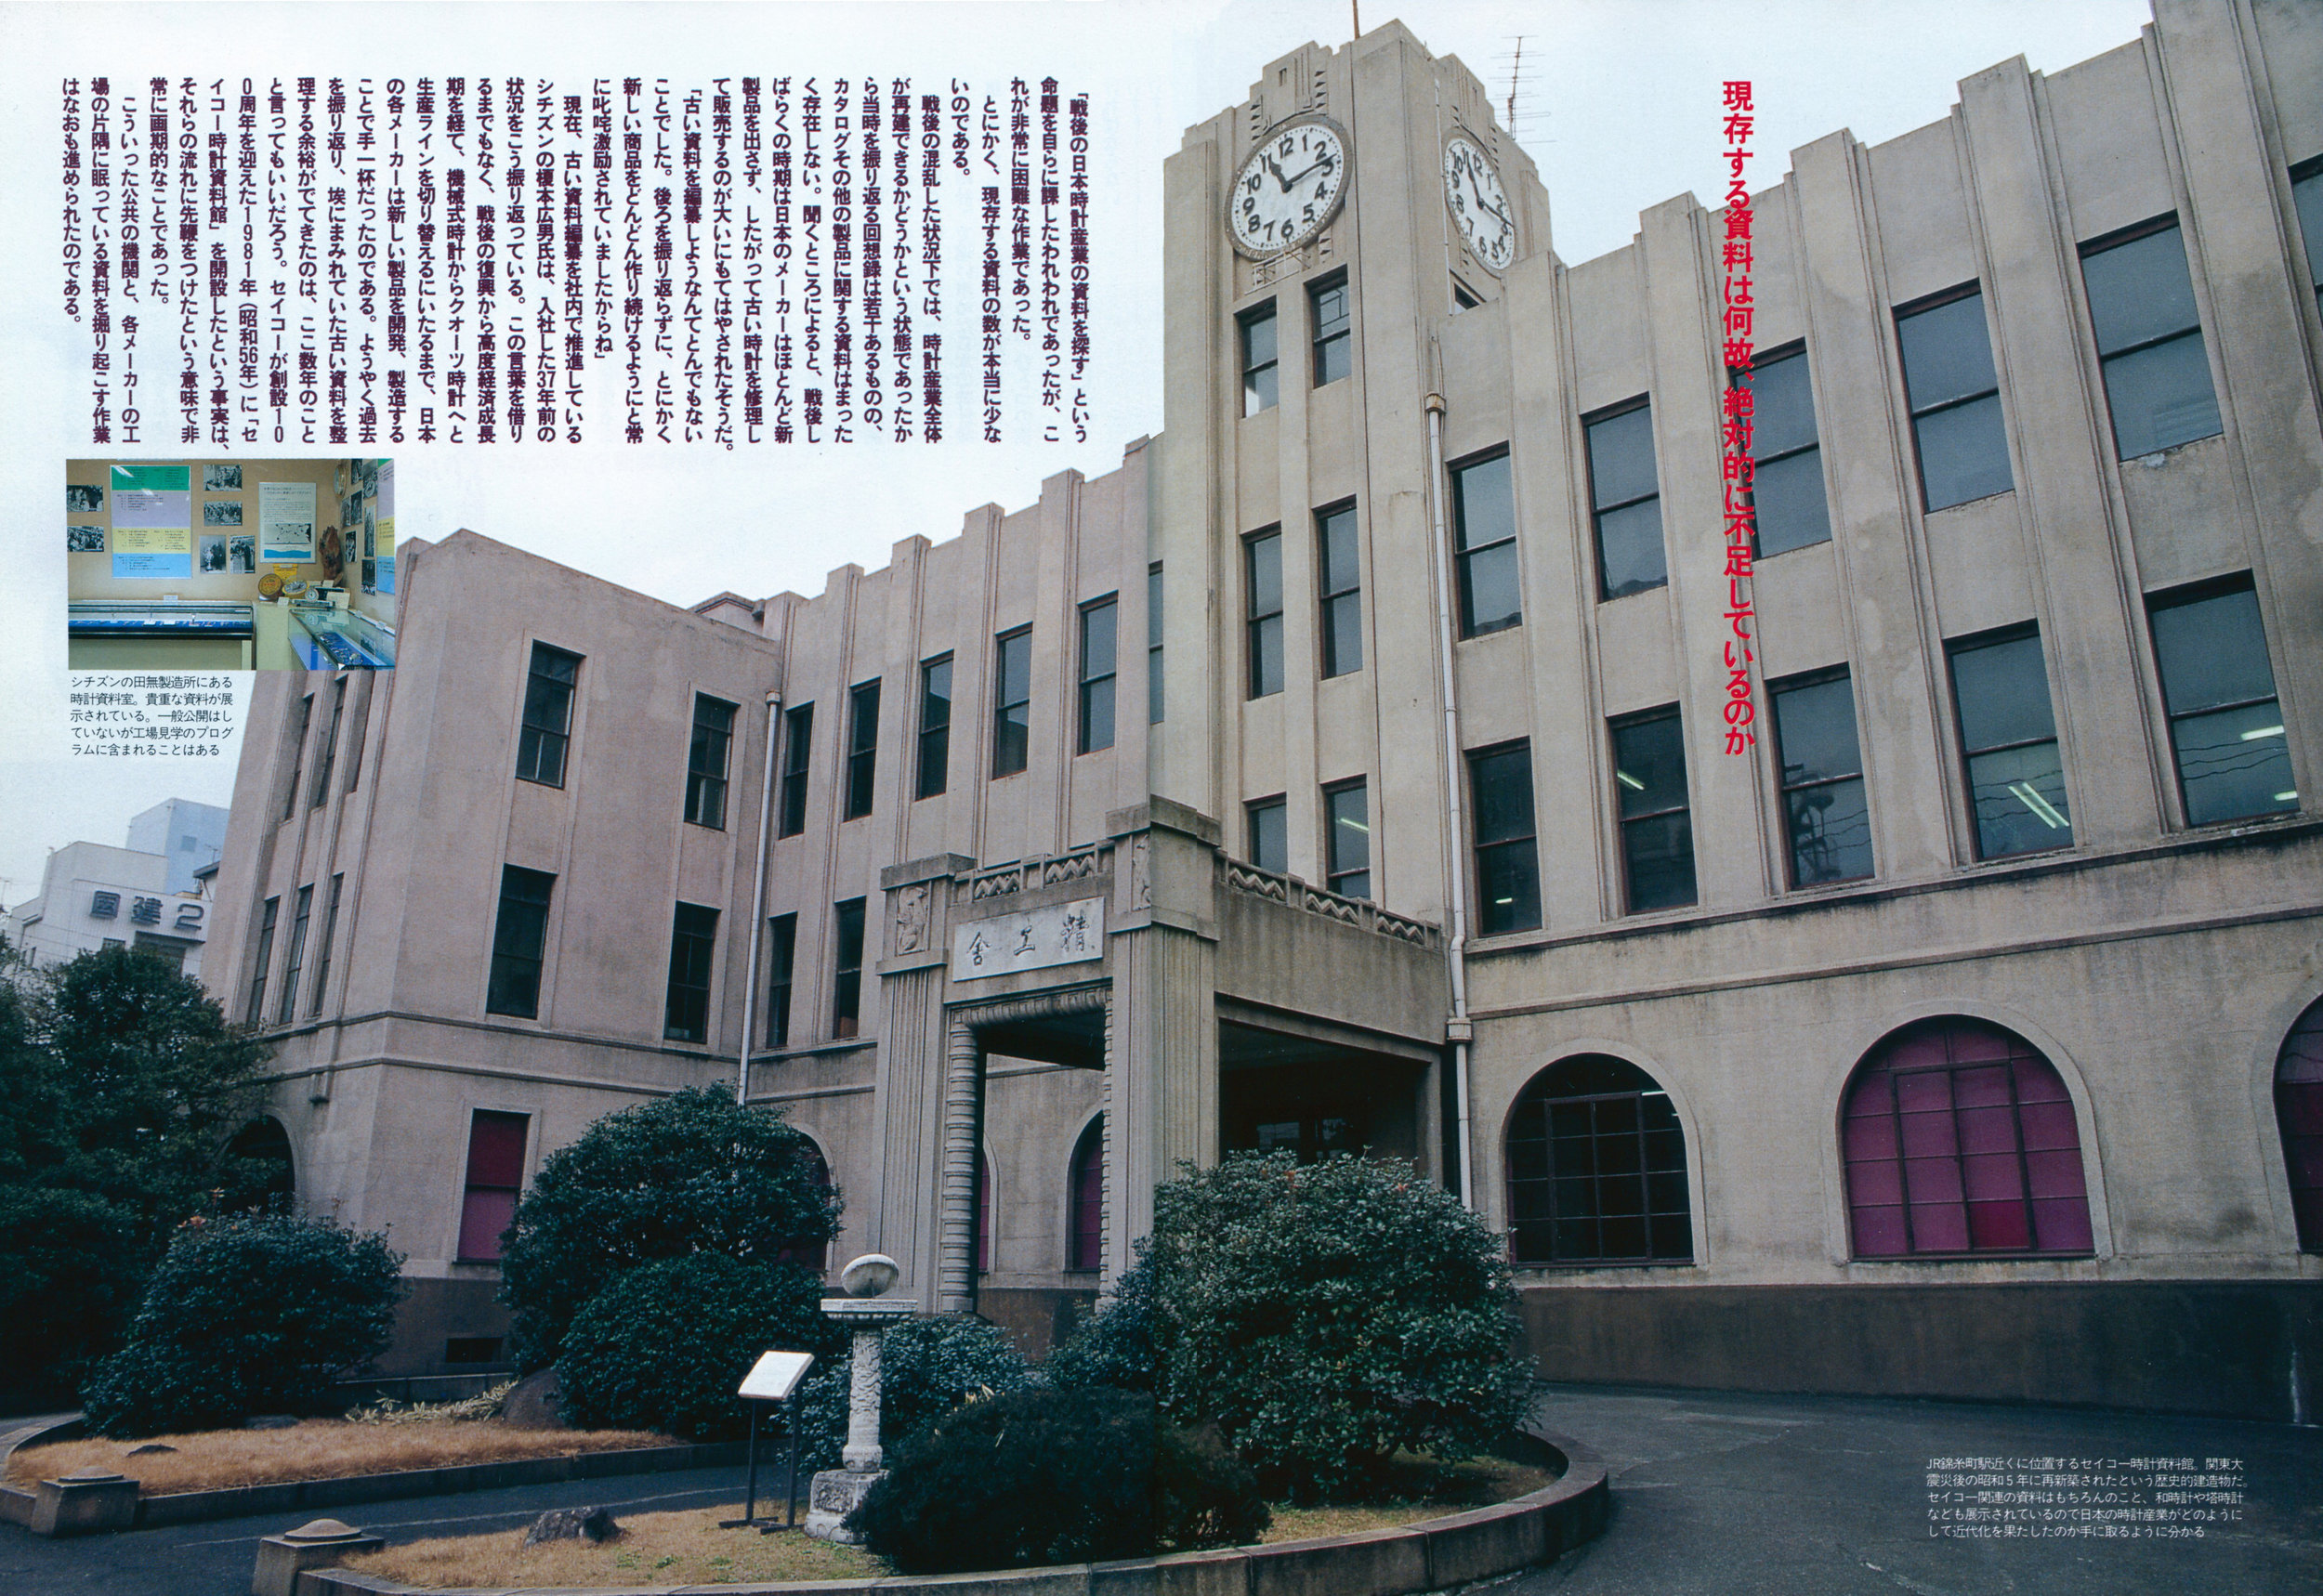 Seiko Institute of Horrology